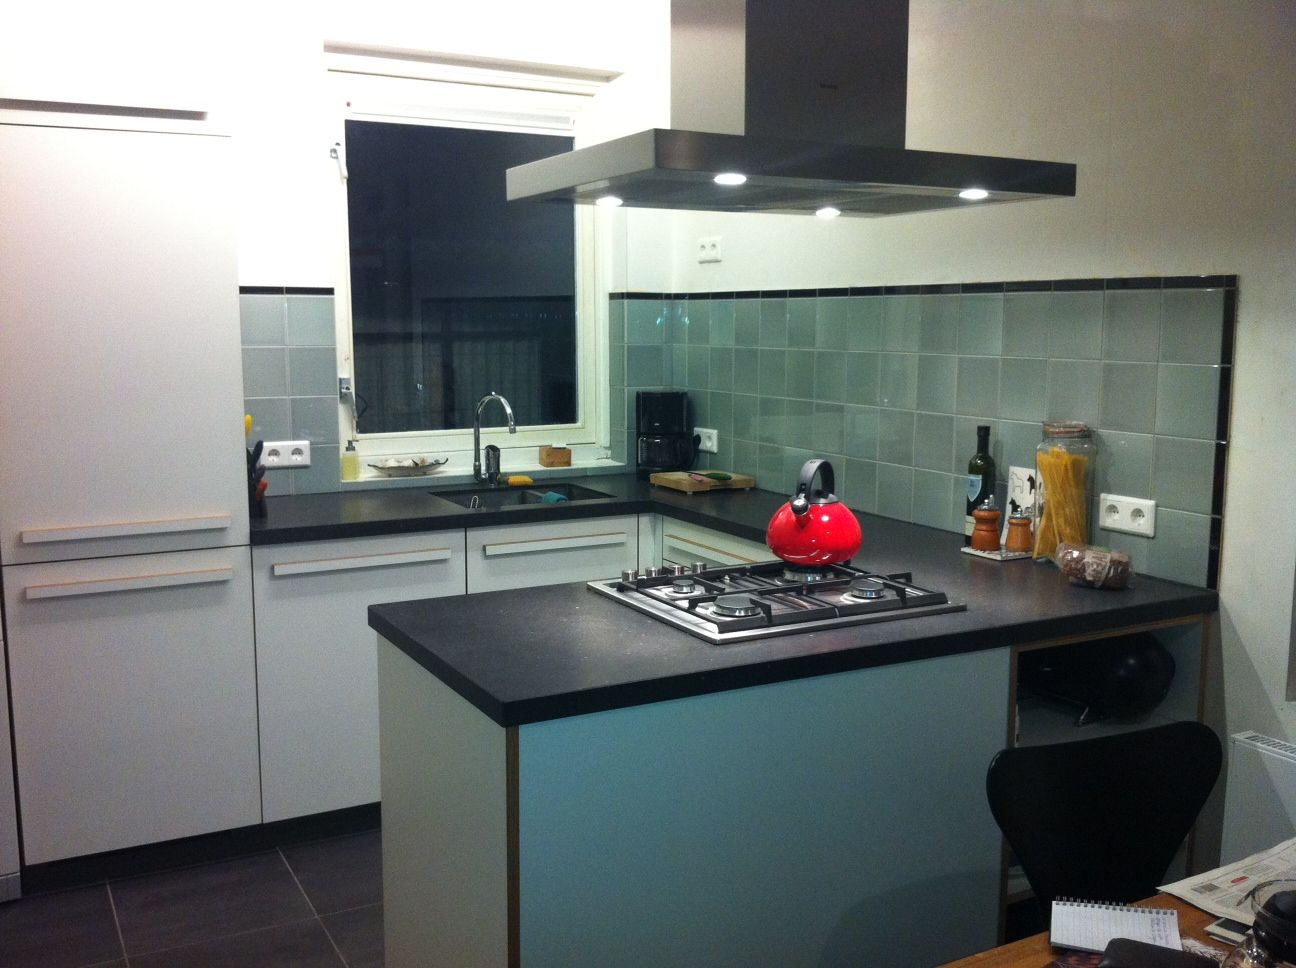 Groene Wandtegels Keuken : Wandtegels piet zwart keuken tinglazuur mooie nuances